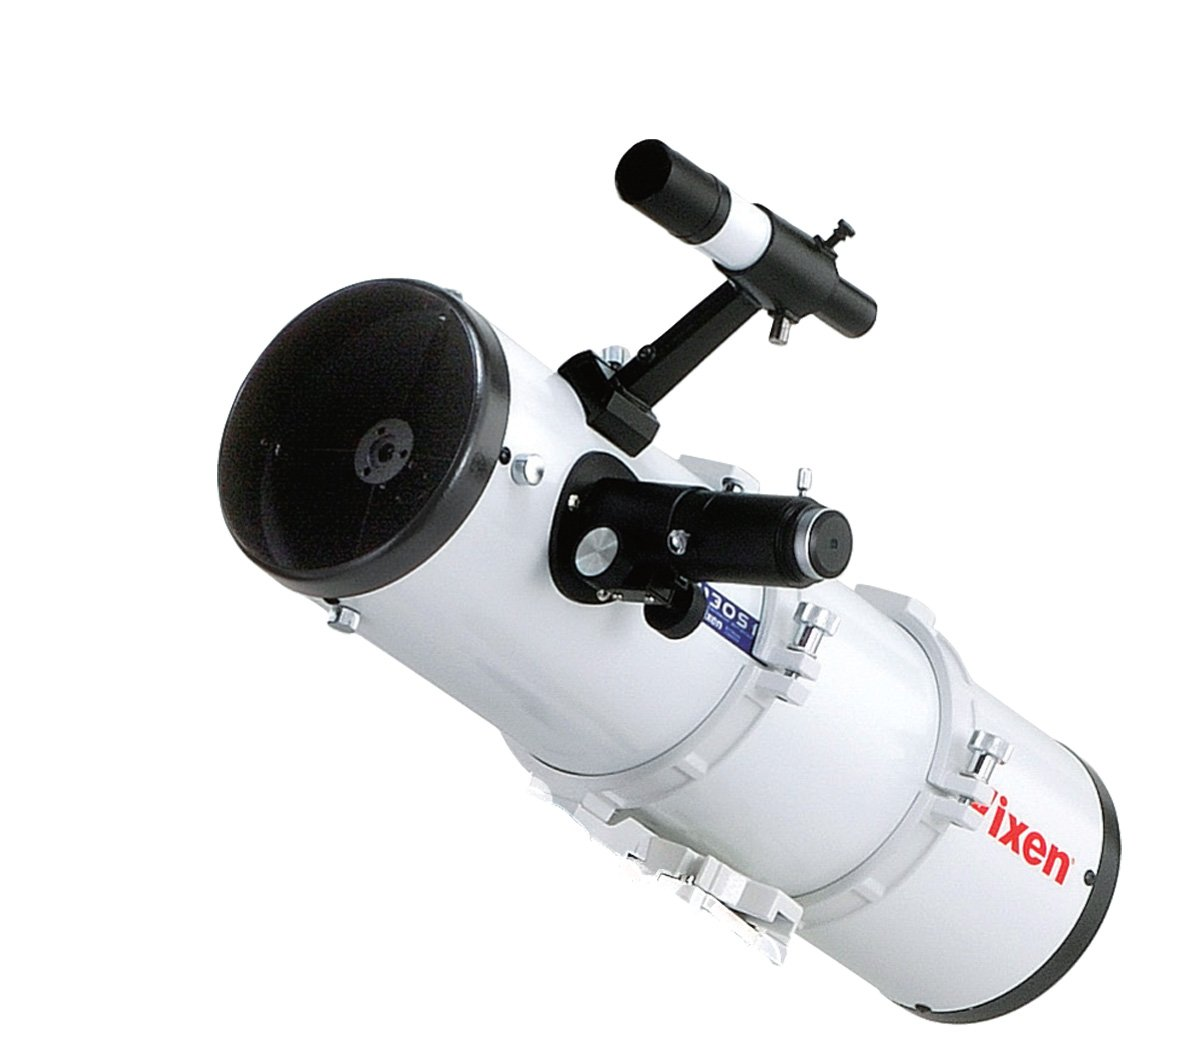 Vixen 2604 R130Sf Telescope by Vixen B001KW07Q4